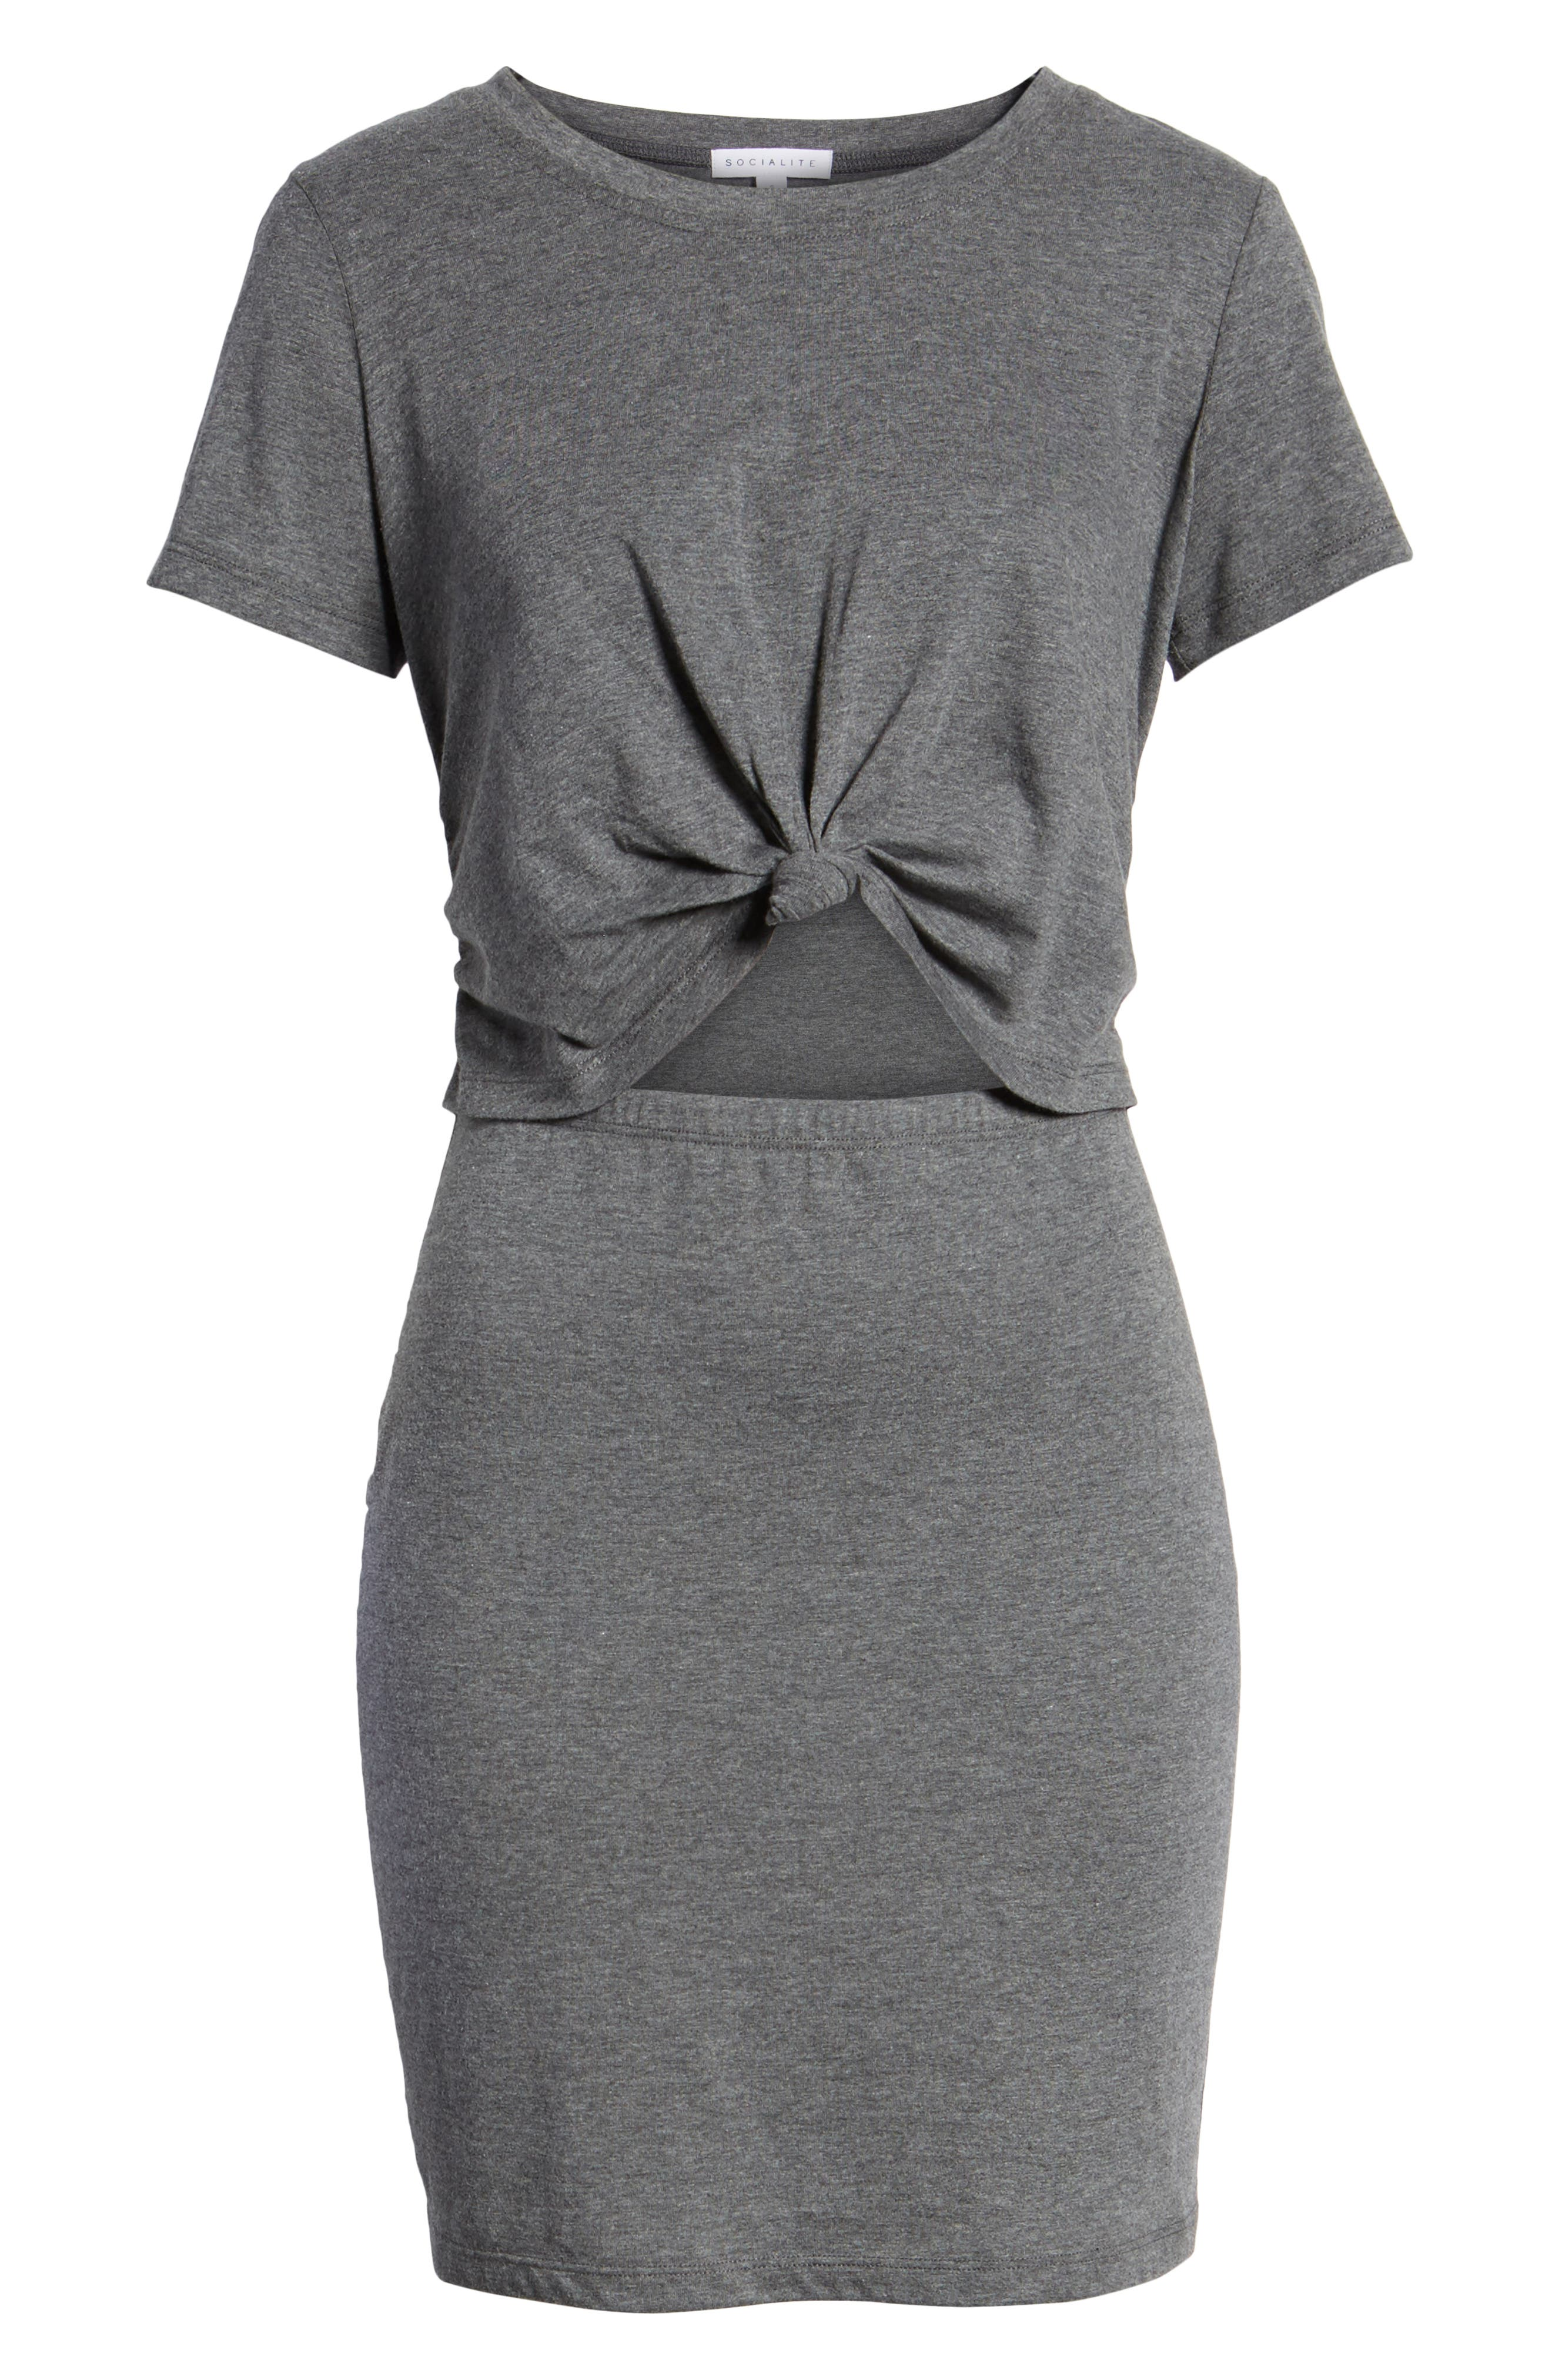 Knot Front Cutout Dress,                             Alternate thumbnail 7, color,                             Heather Grey